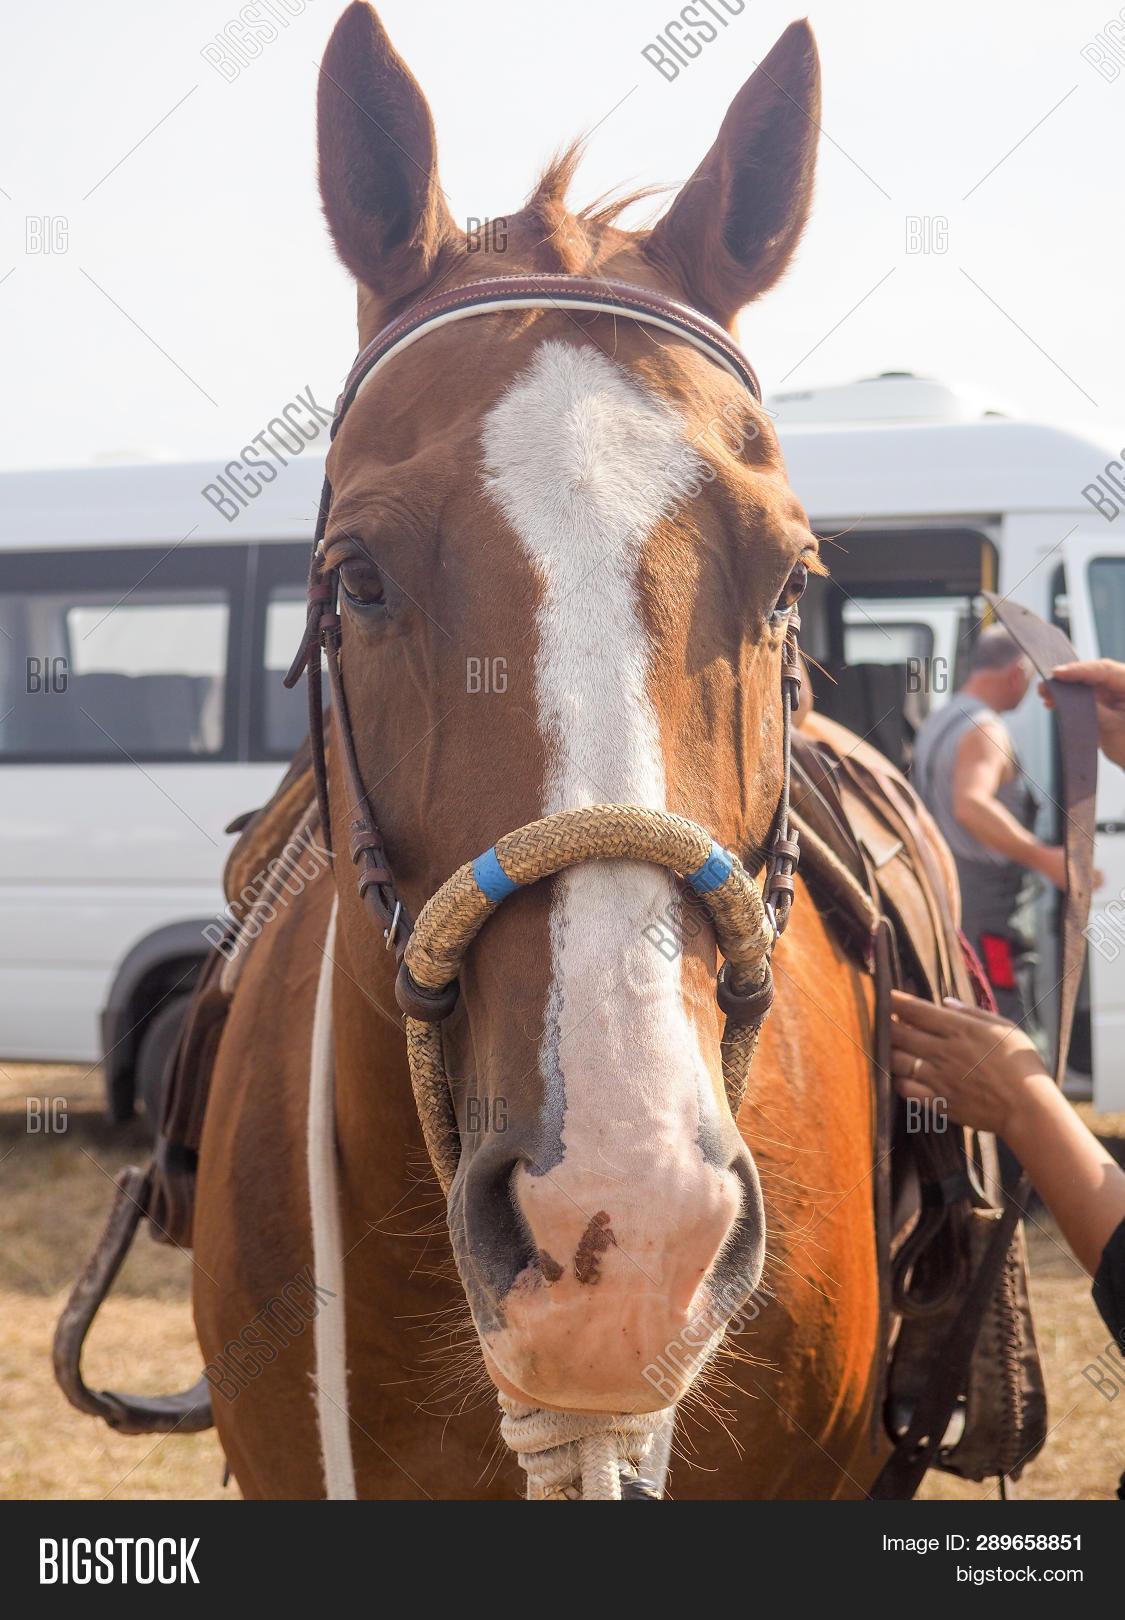 Brown Horse Head Reins Image Photo Free Trial Bigstock